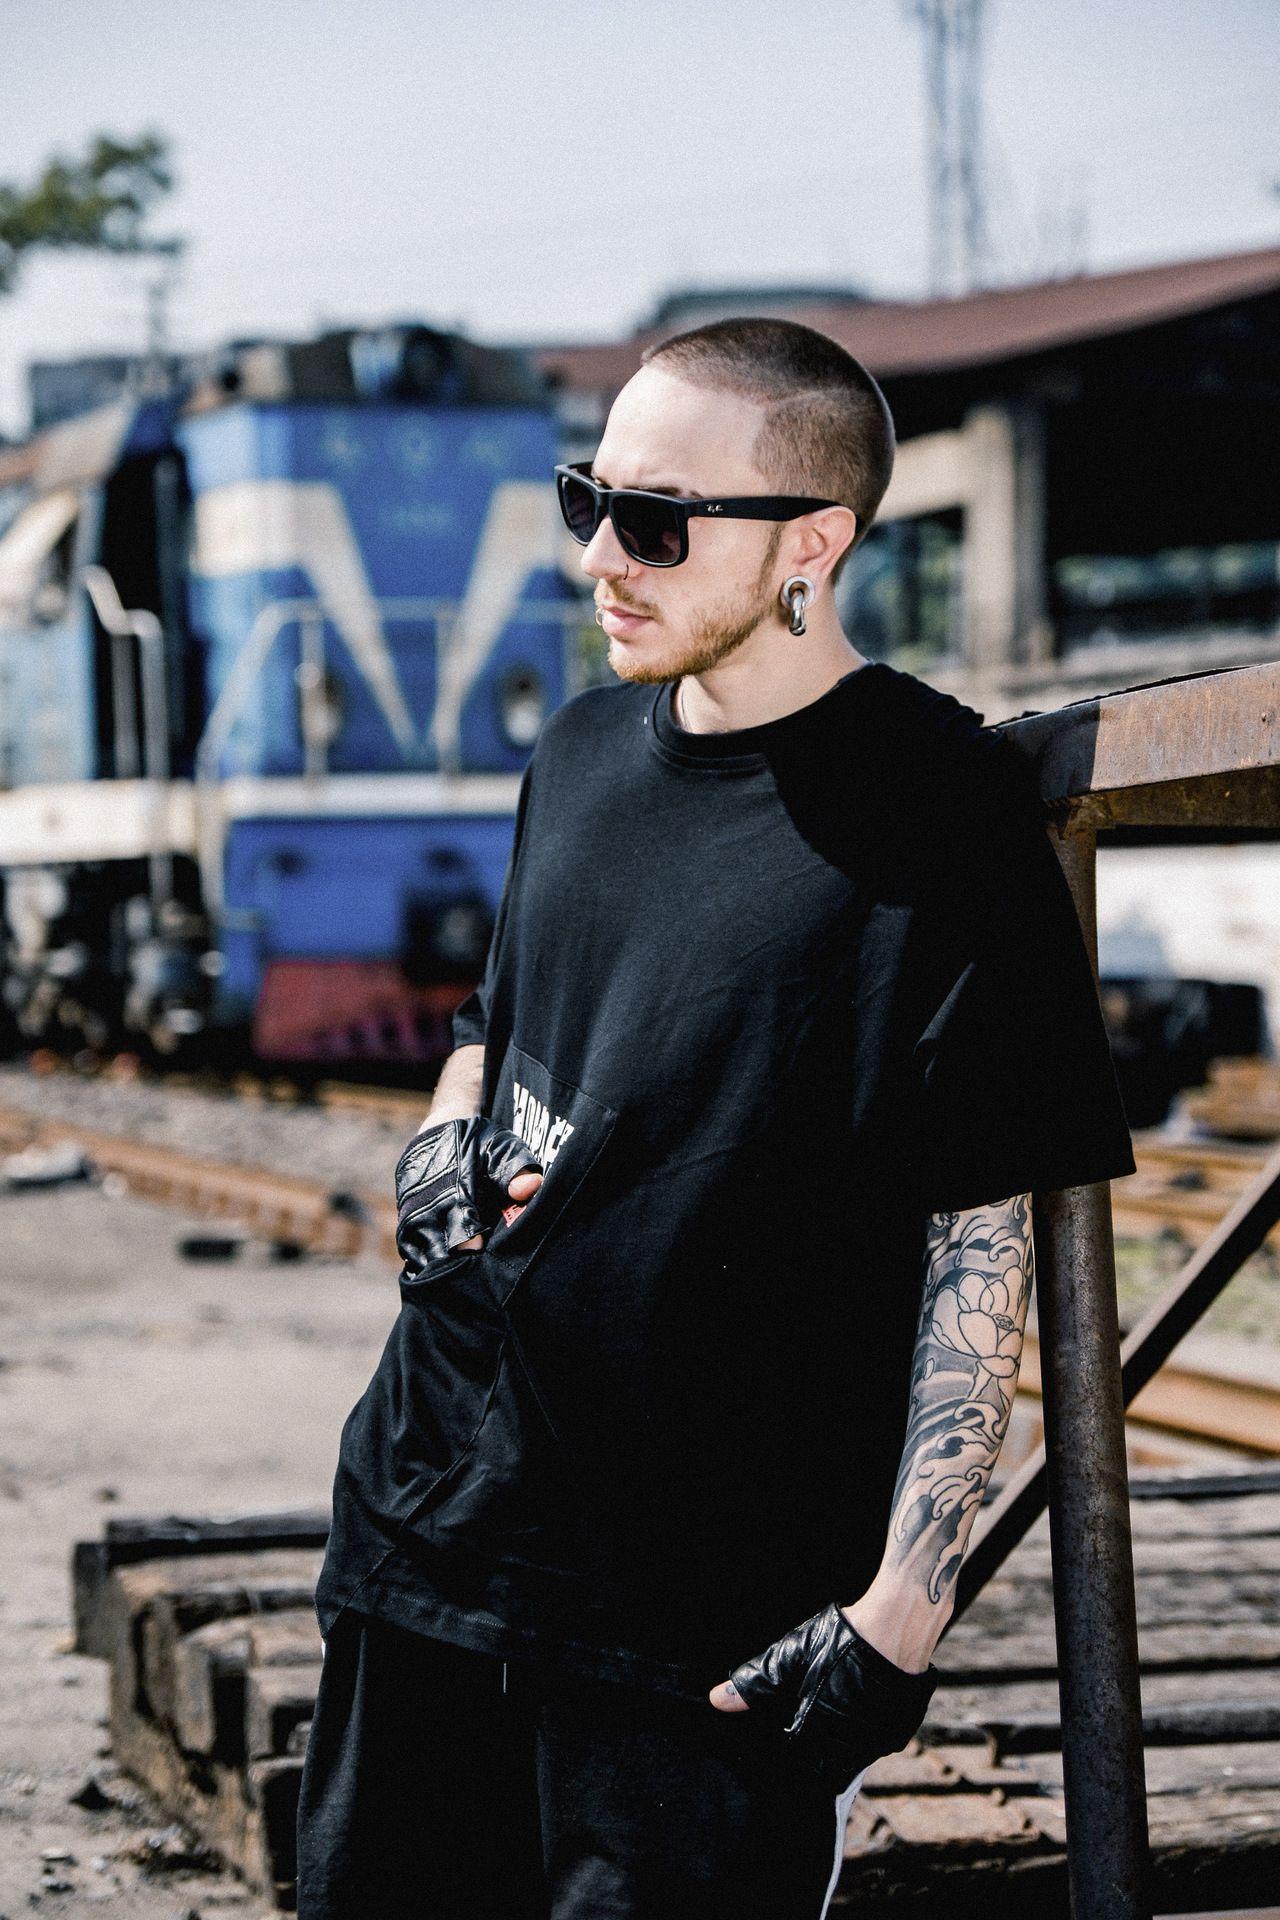 2efd08ef New Style Street Loose Half Sleeveless Shirt Male And Female Hip Hop ...